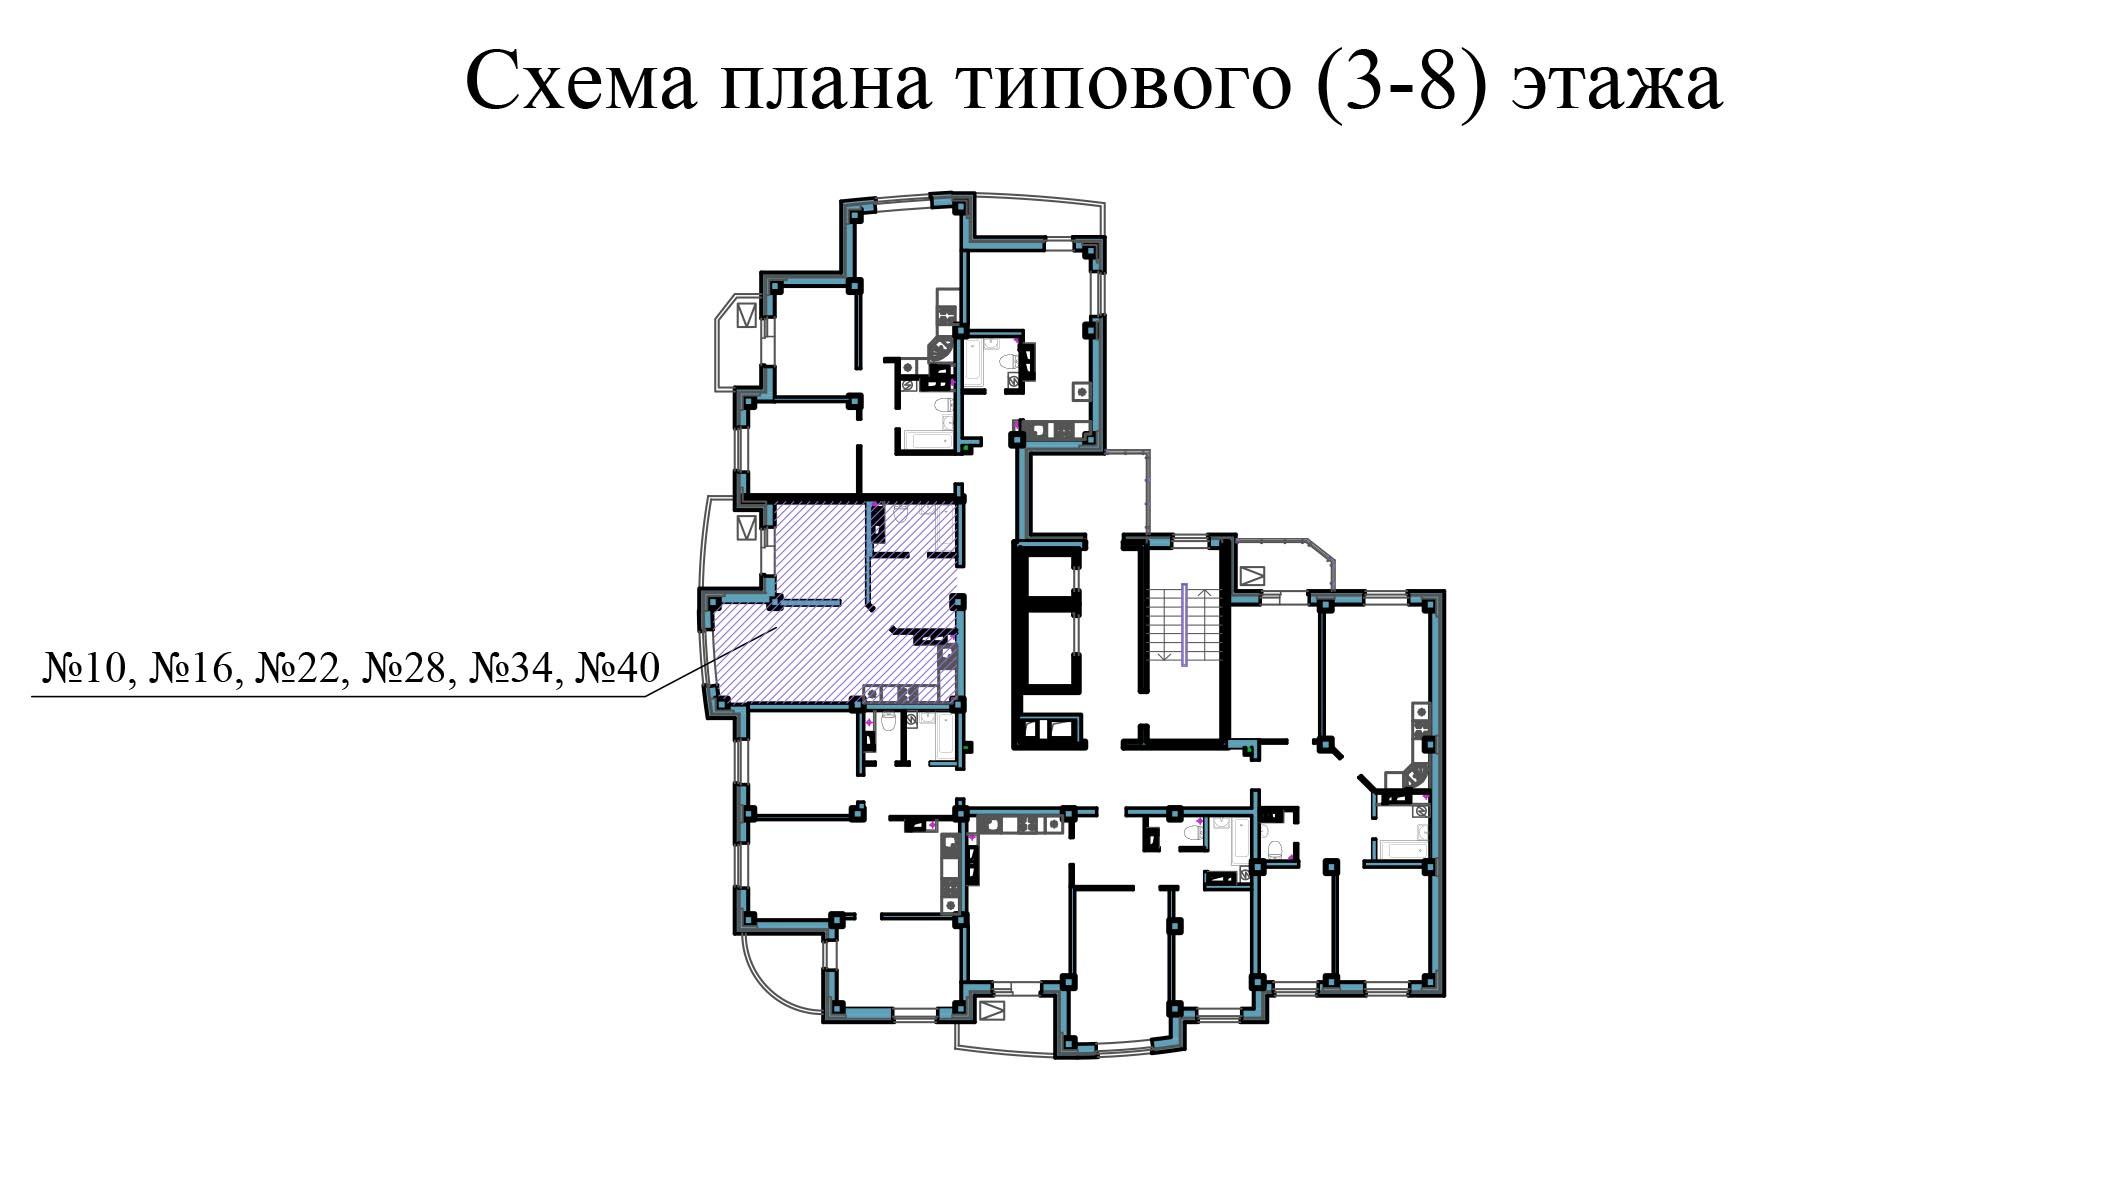 Однокомнатная квартира - ул.Балтийская, д. 1а, кв. 28